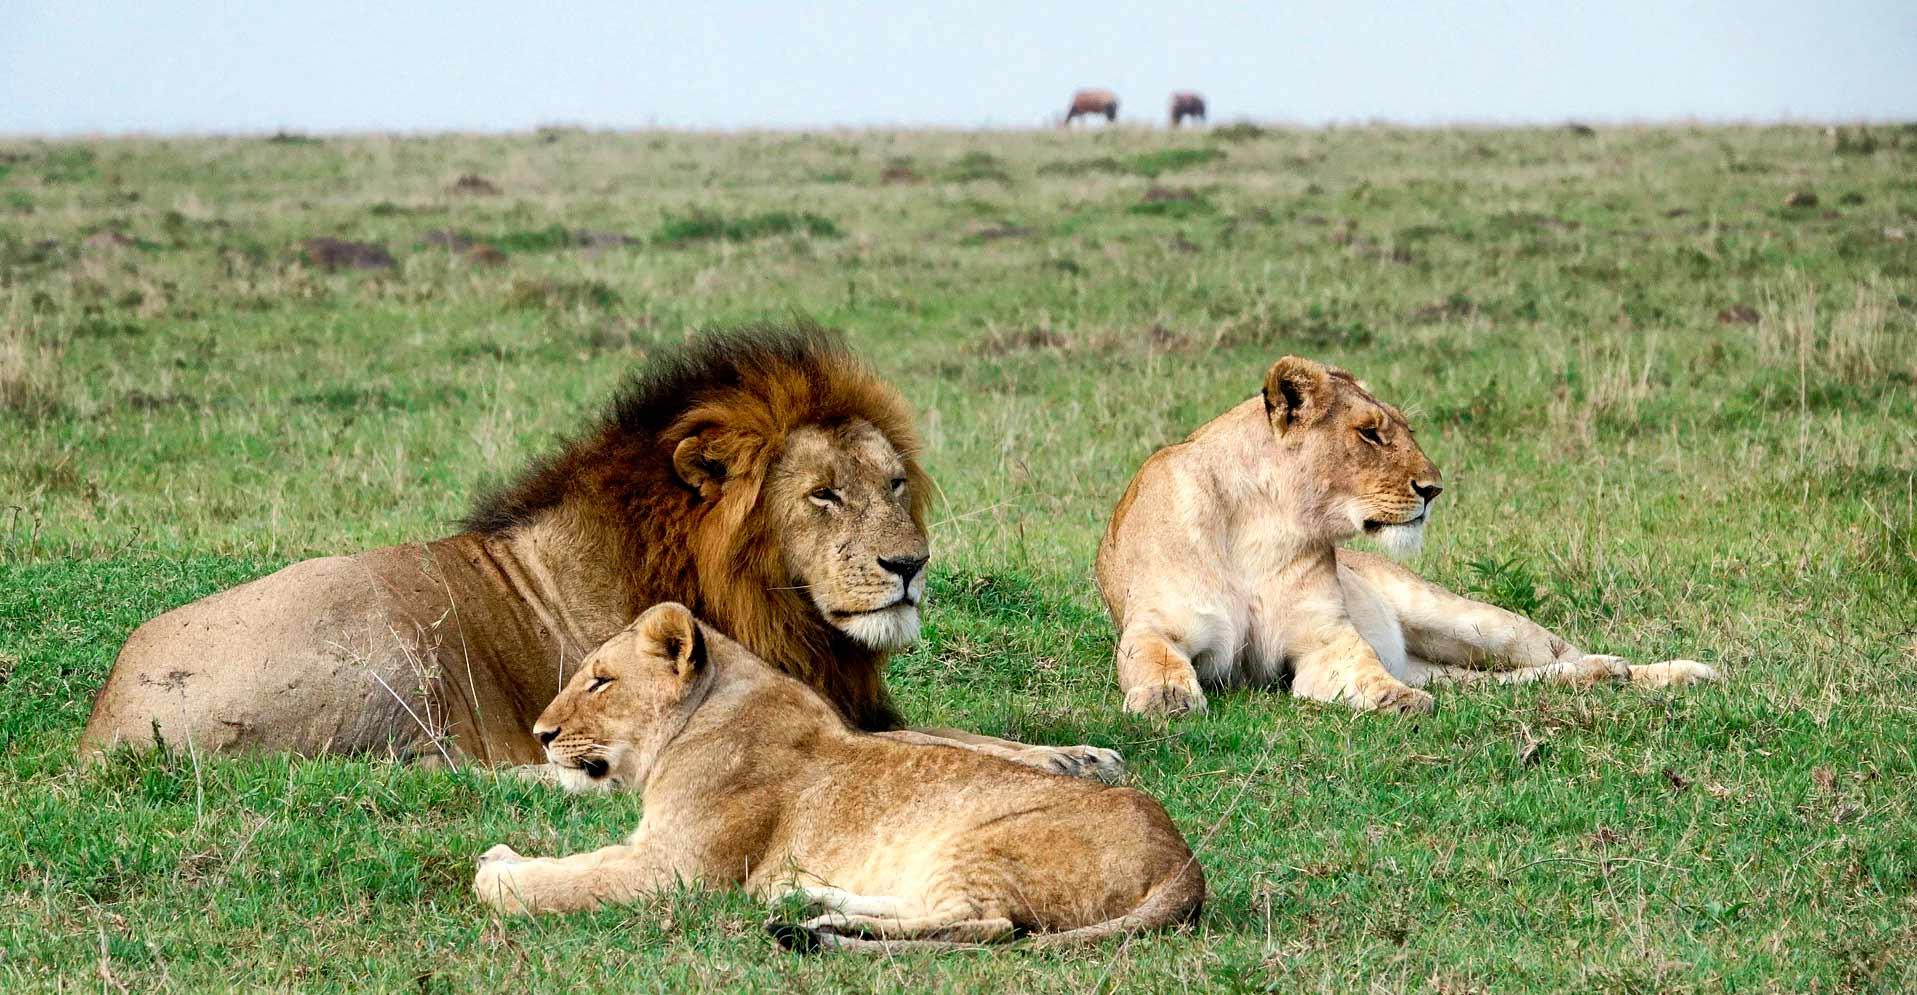 Qué ver en Kenia - Image by Margo Tanenbaum from Pixabay